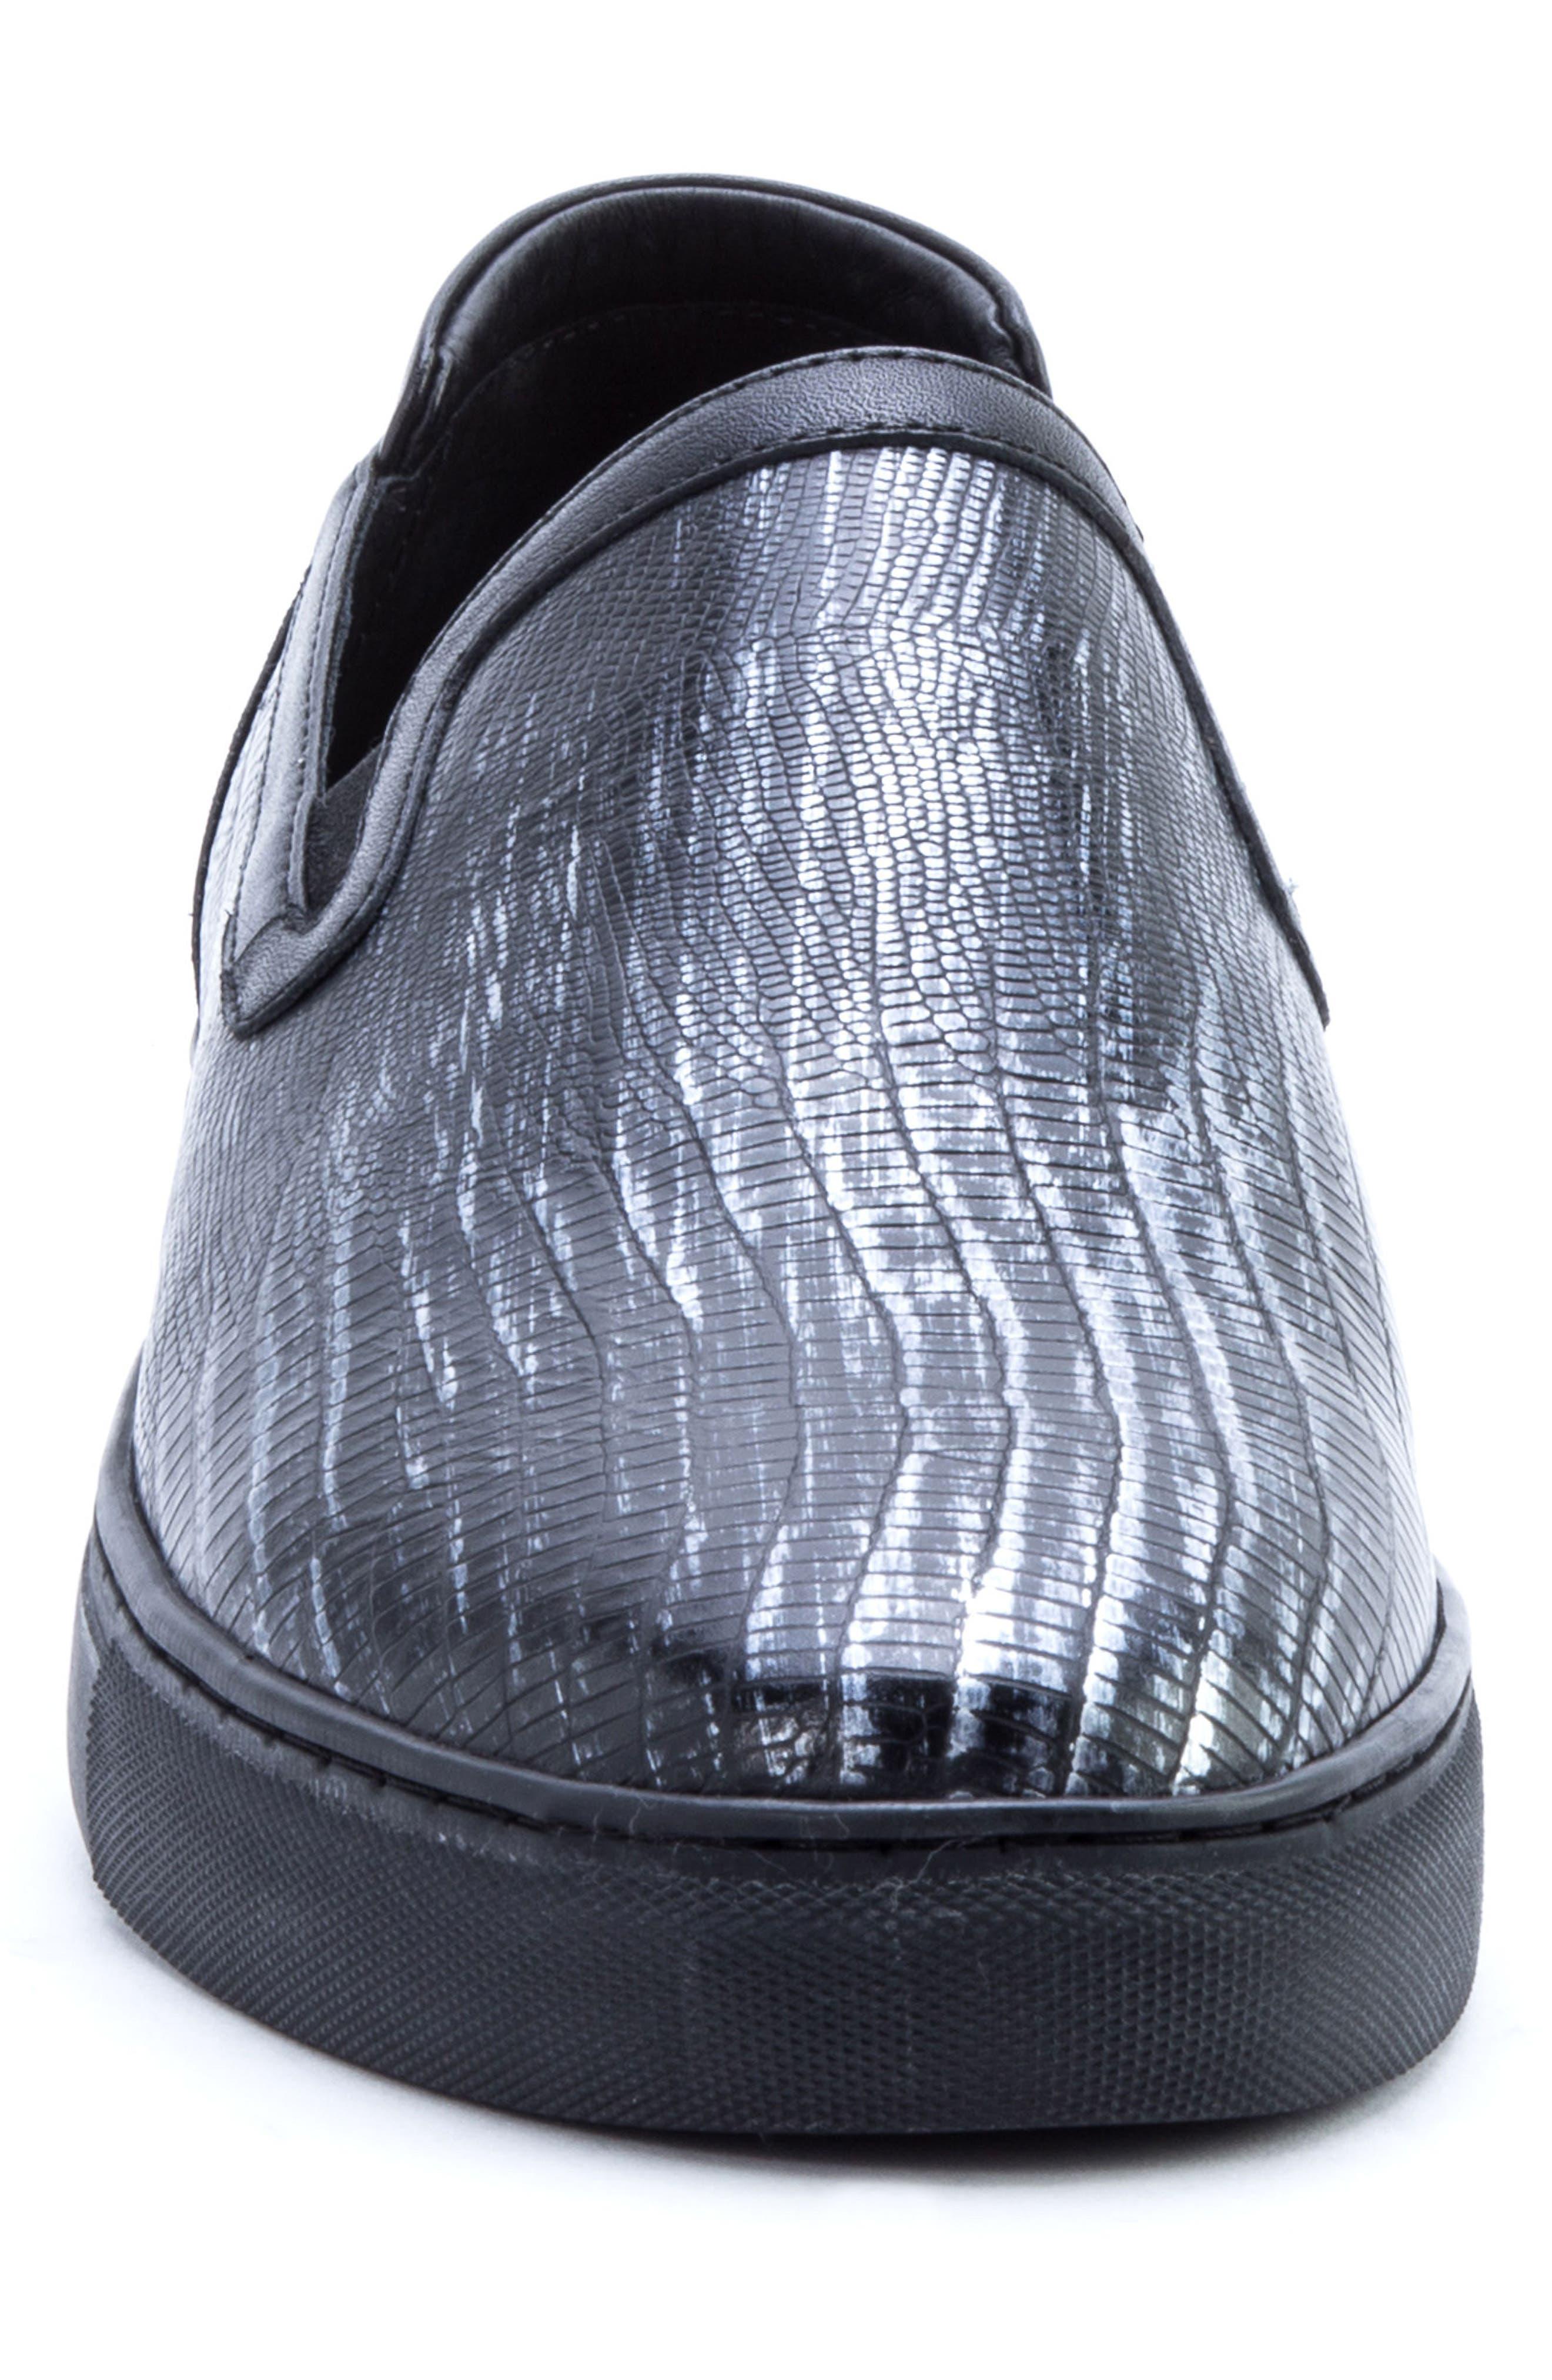 BADGLEY MISCHKA COLLECTION, Badgley Mischka Bogart Sneaker, Alternate thumbnail 4, color, BLACK LEATHER